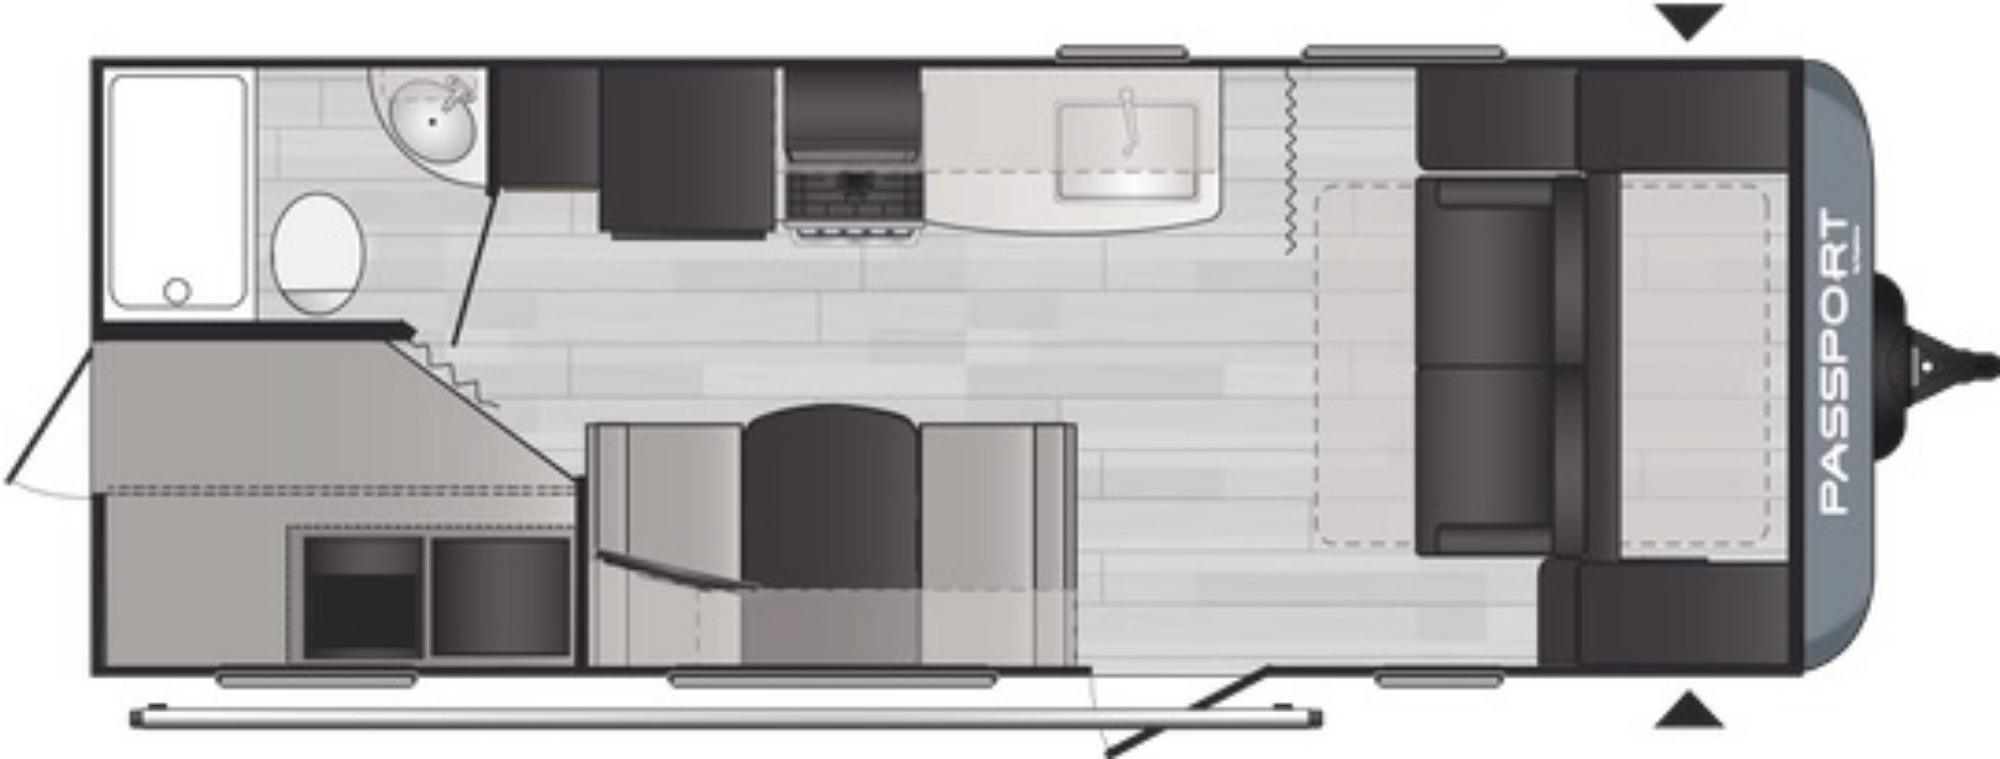 View Floor Plan for 2021 KEYSTONE PASSPORT 219BH